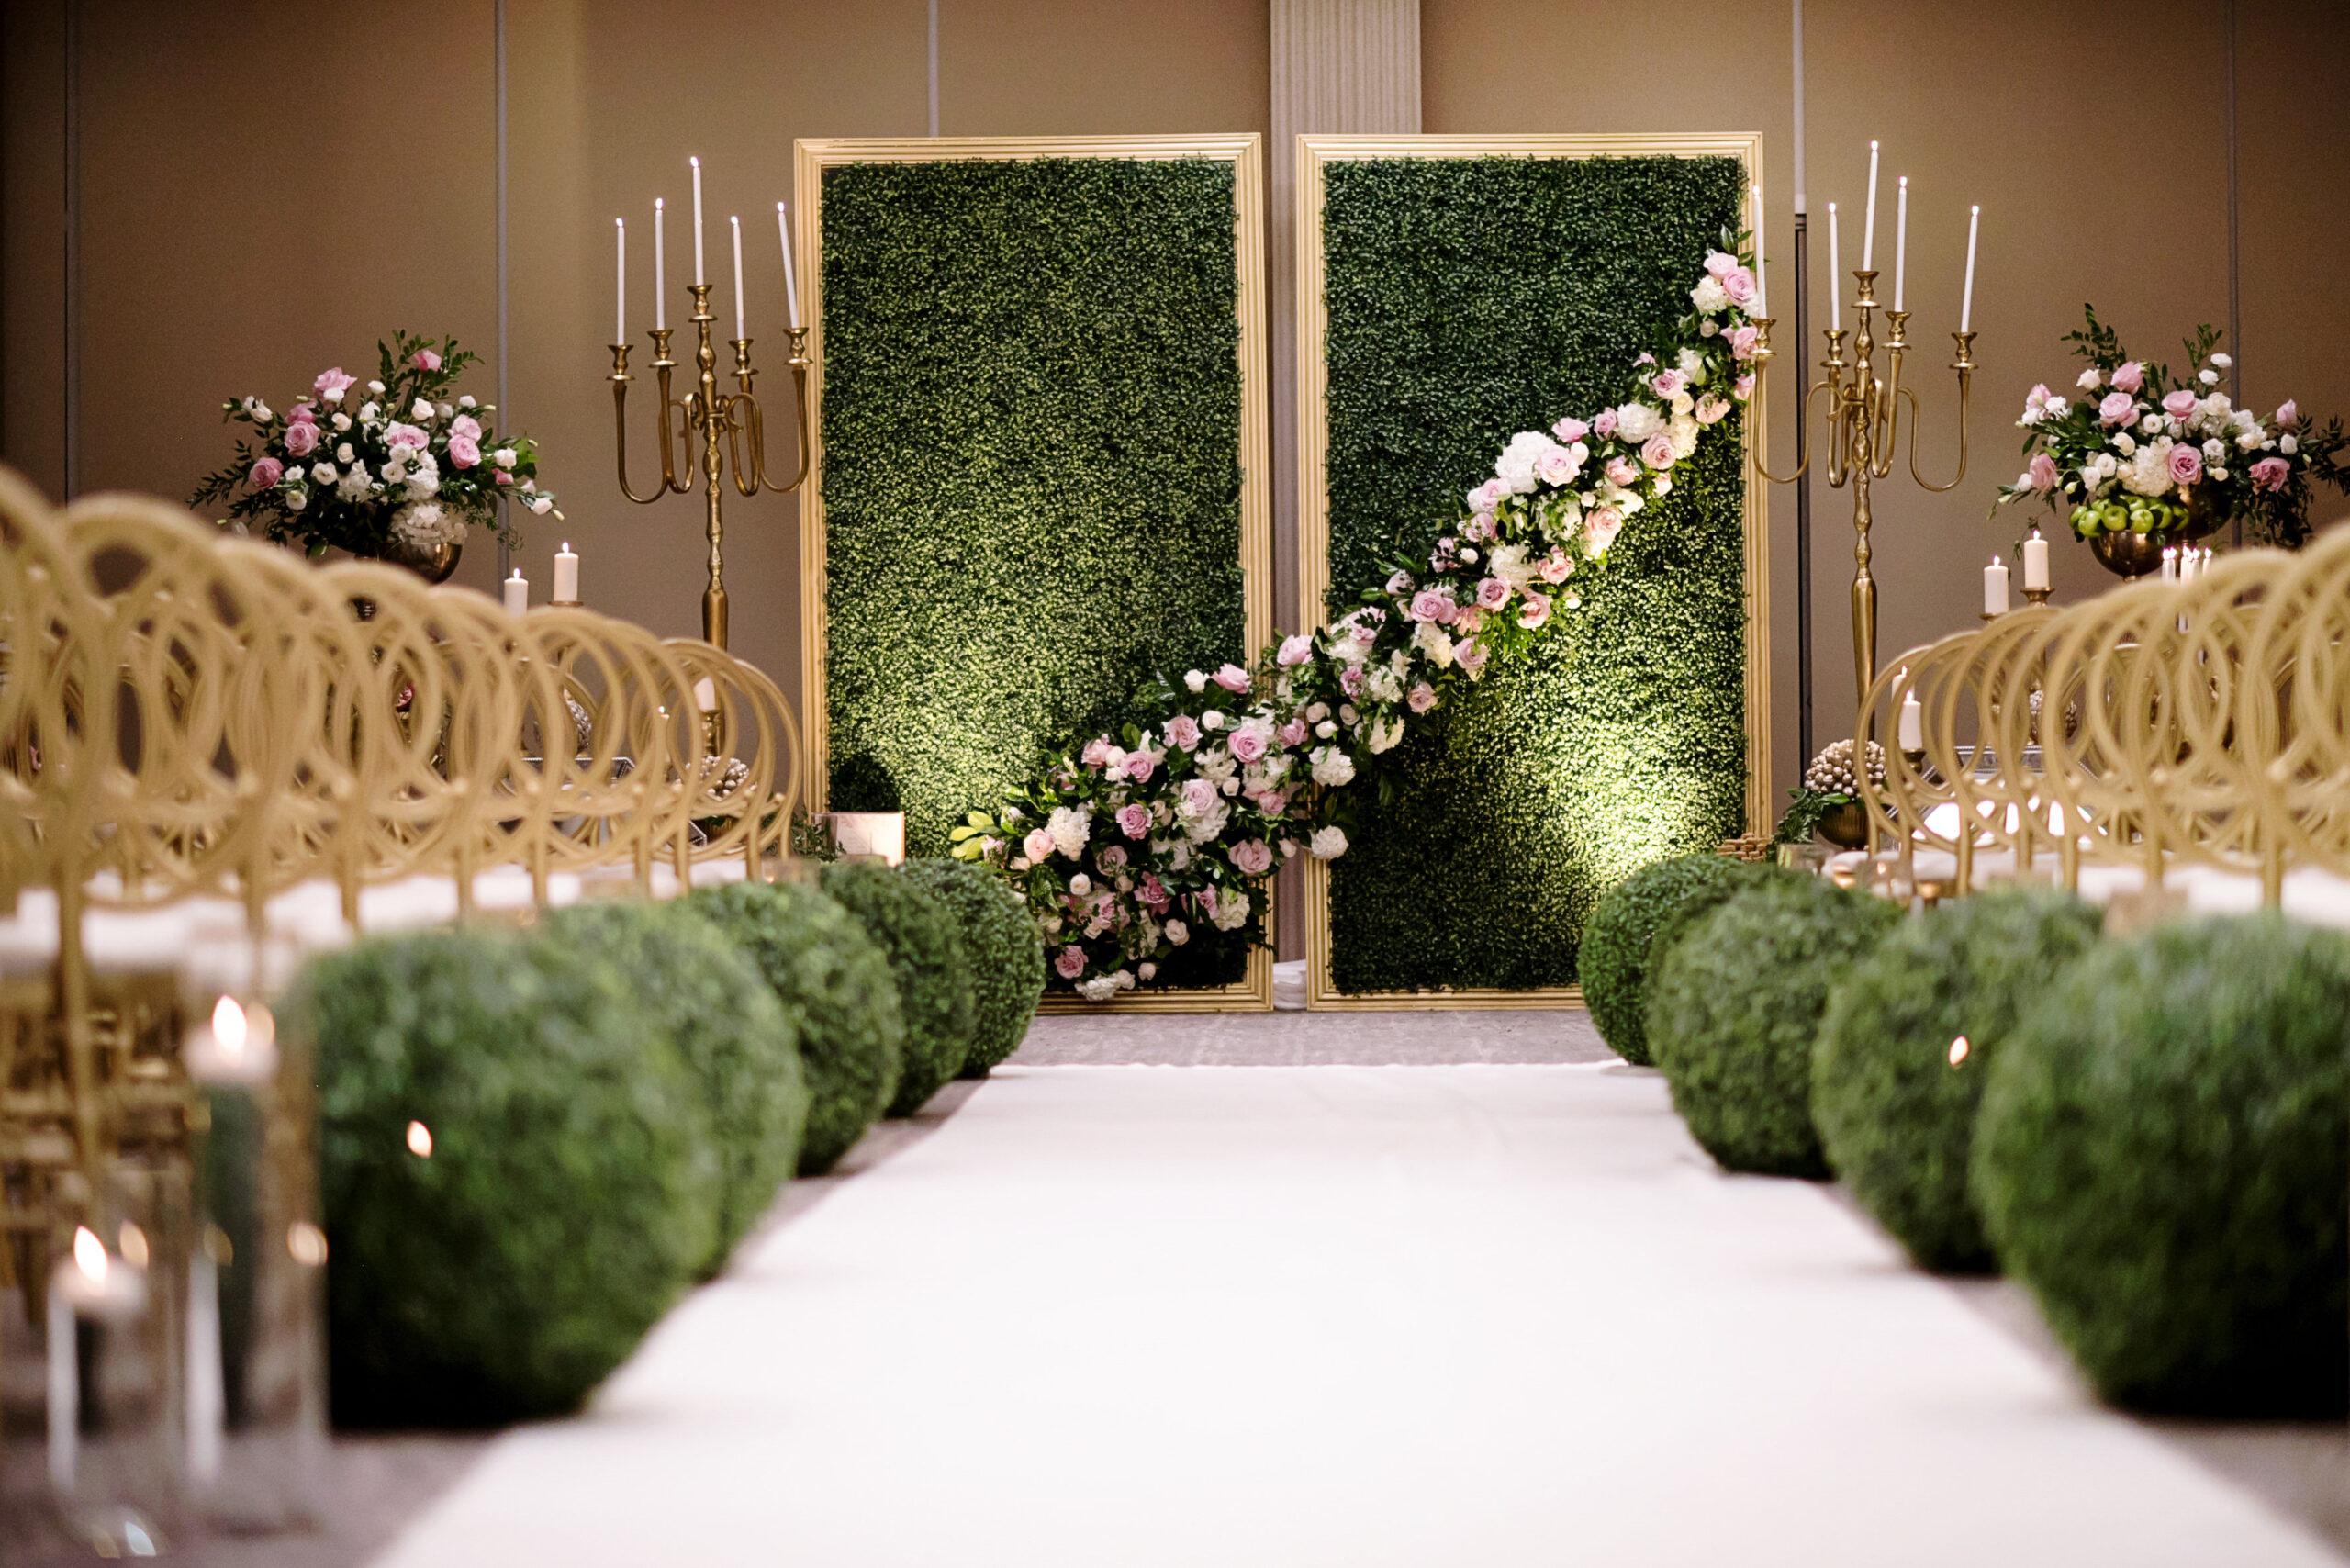 https://secureservercdn.net/45.40.145.151/kgq.ab5.myftpupload.com/wp-content/uploads/2020/04/Sanam-Soroush-s-Wedding-wedluxe-submission-0036-scaled.jpg?time=1606414923